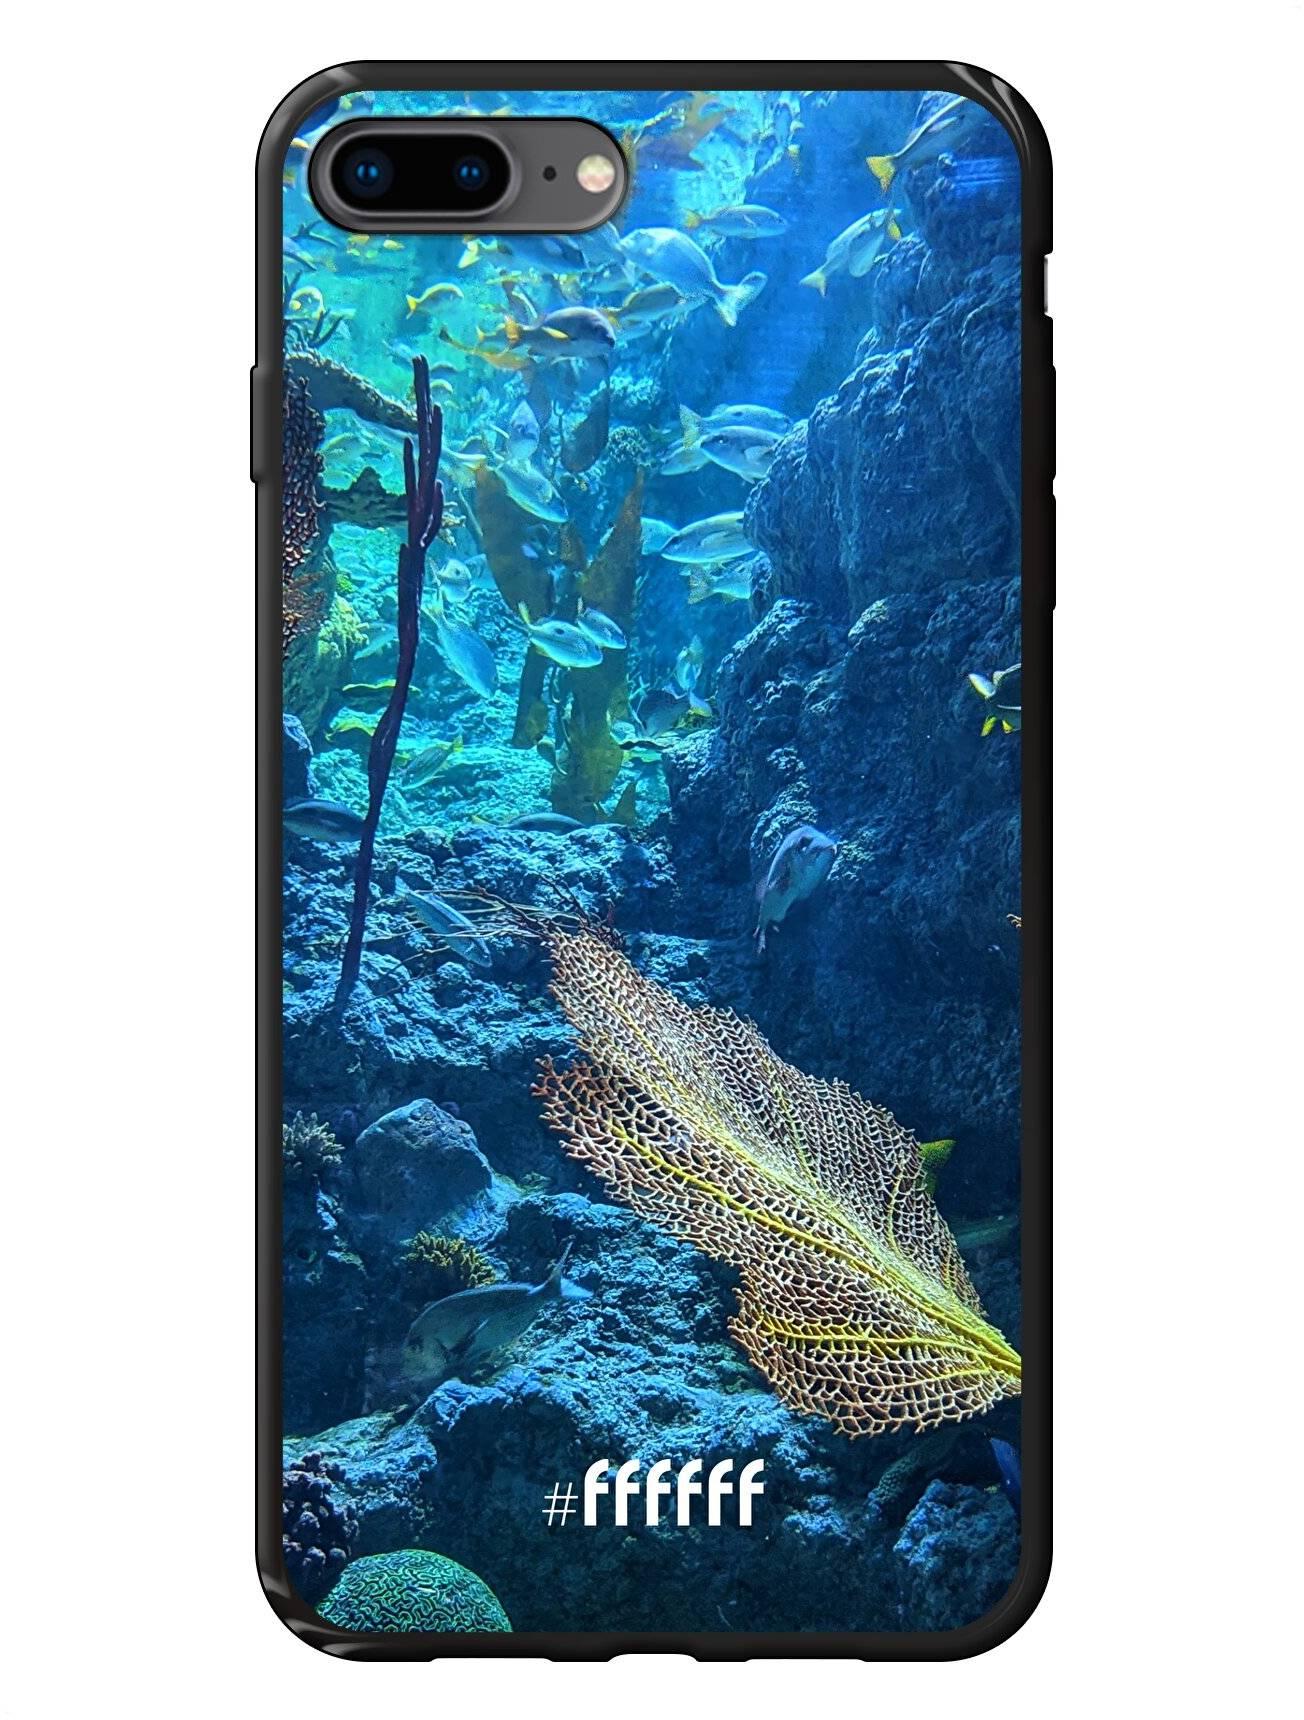 Coral Reef iPhone 8 Plus